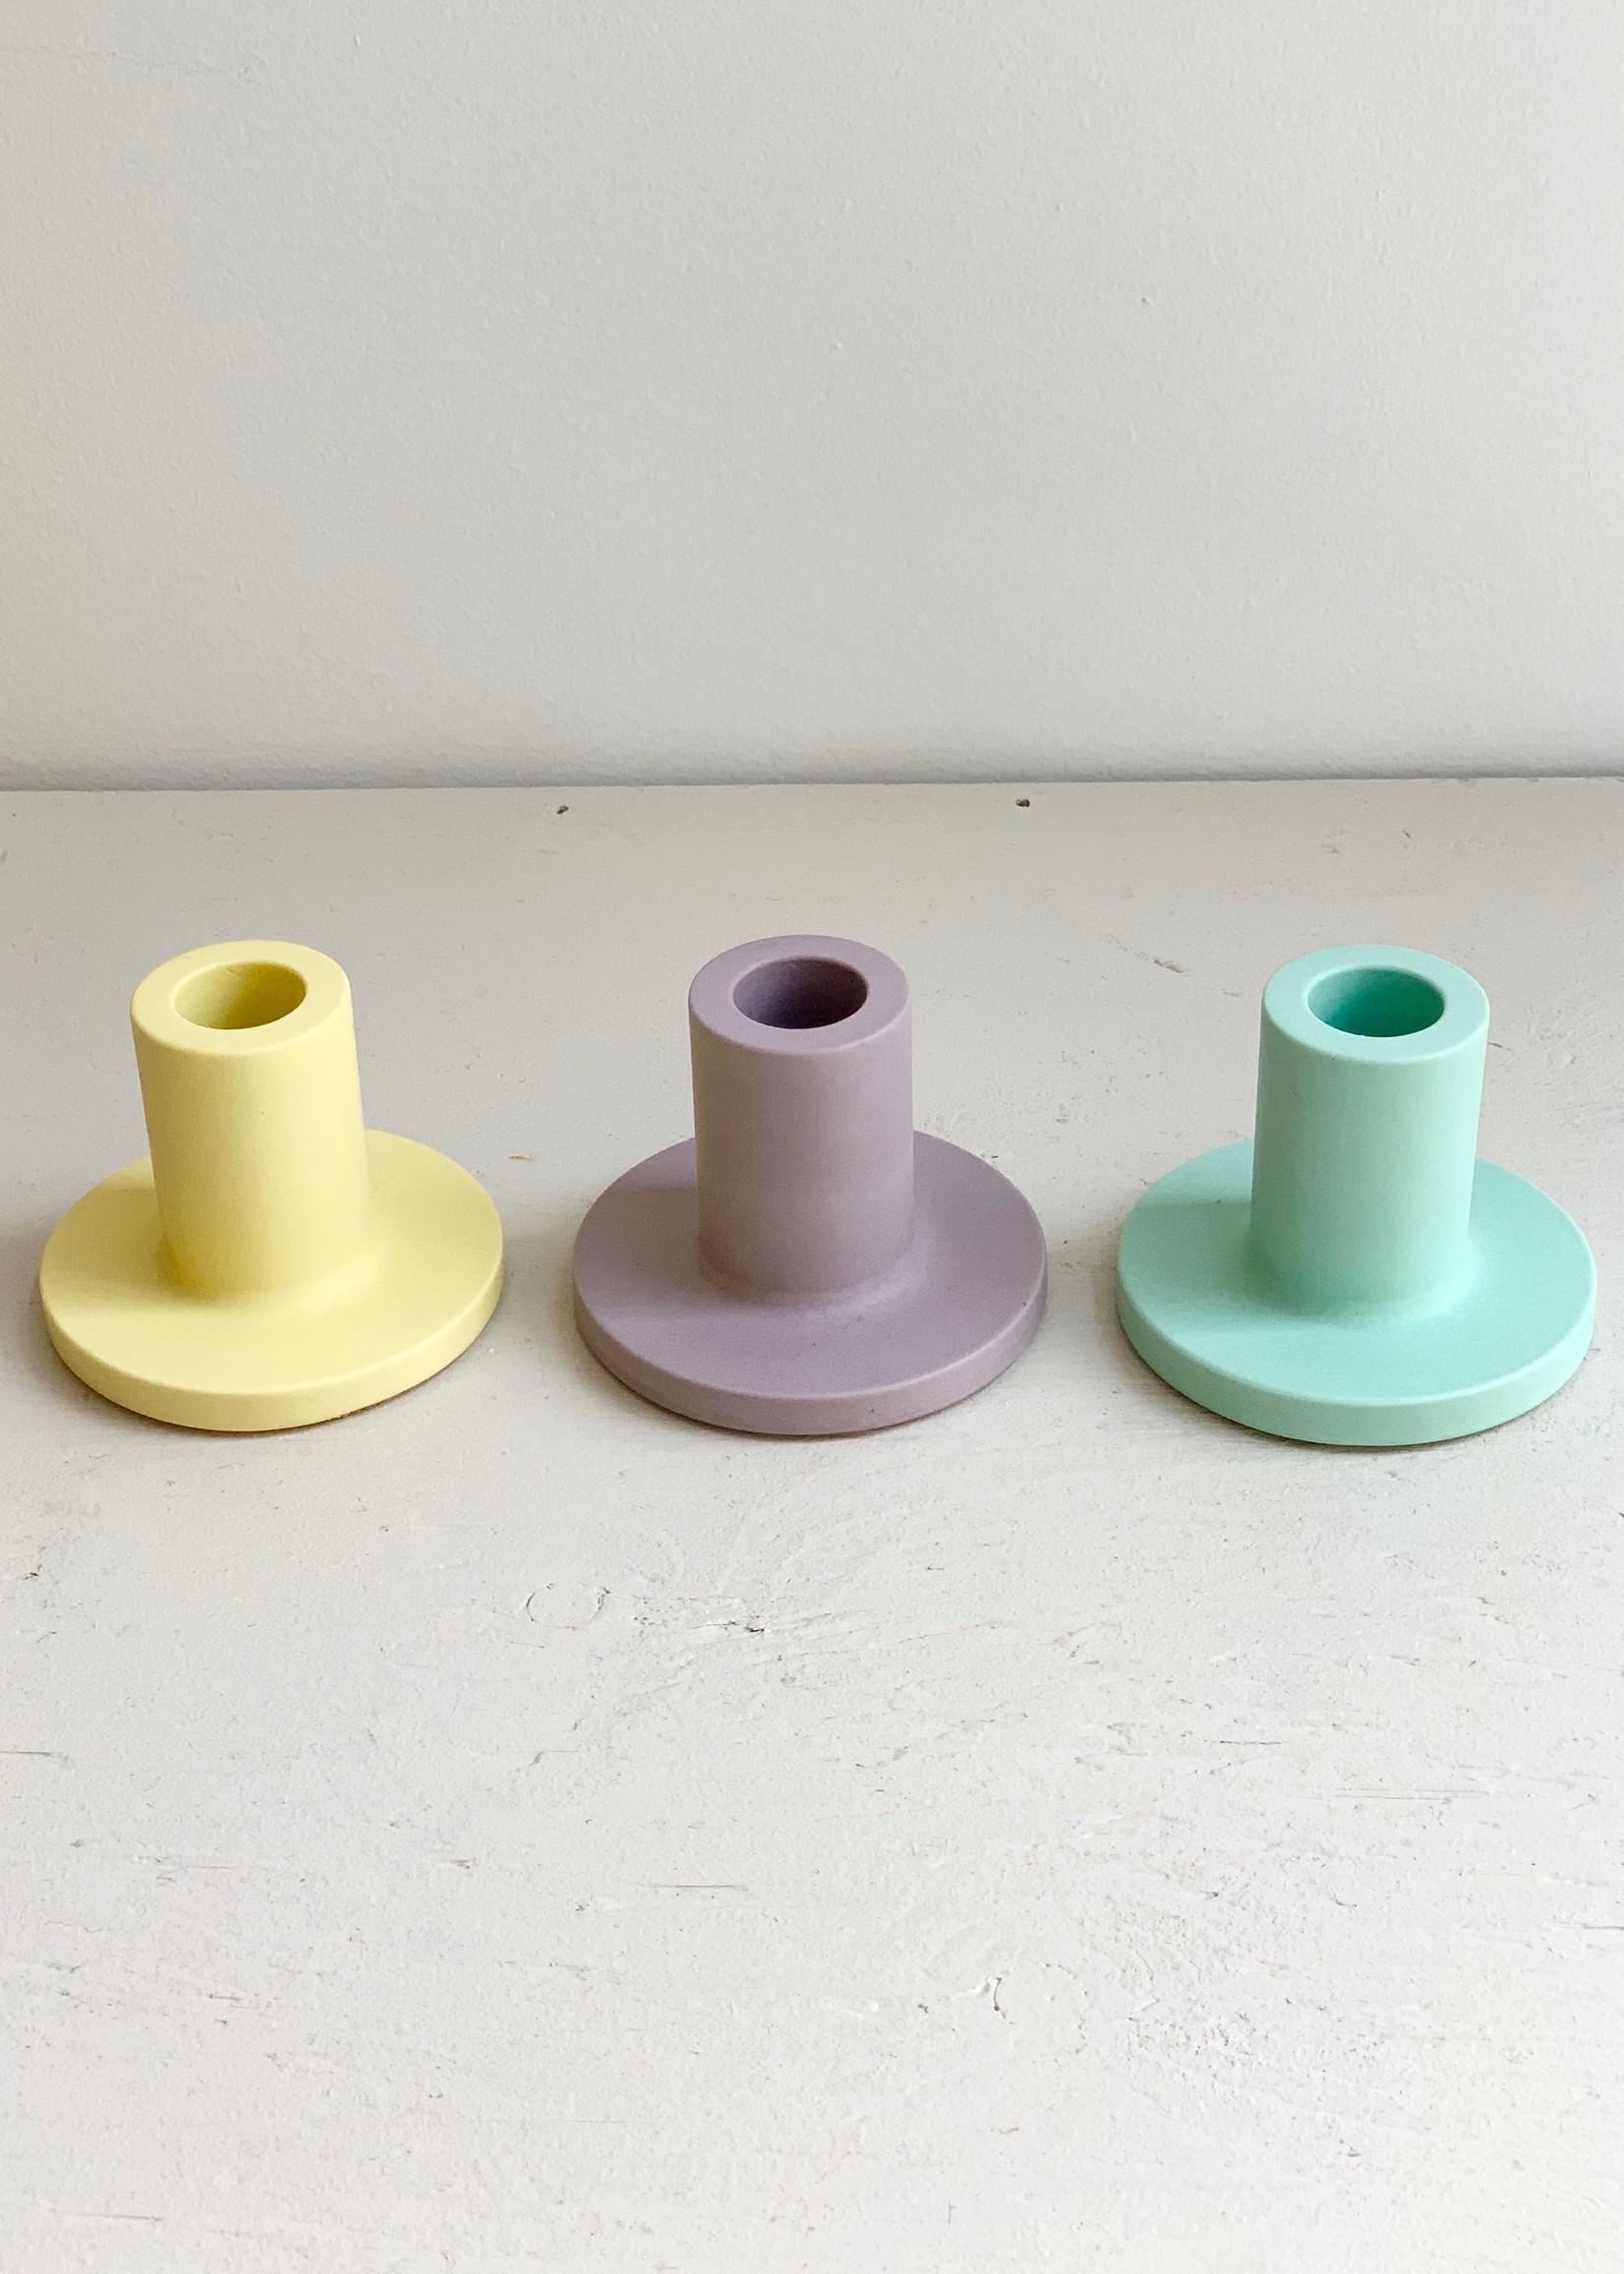 Razzo Studio Portes-bougie pastel par Razzo Studio